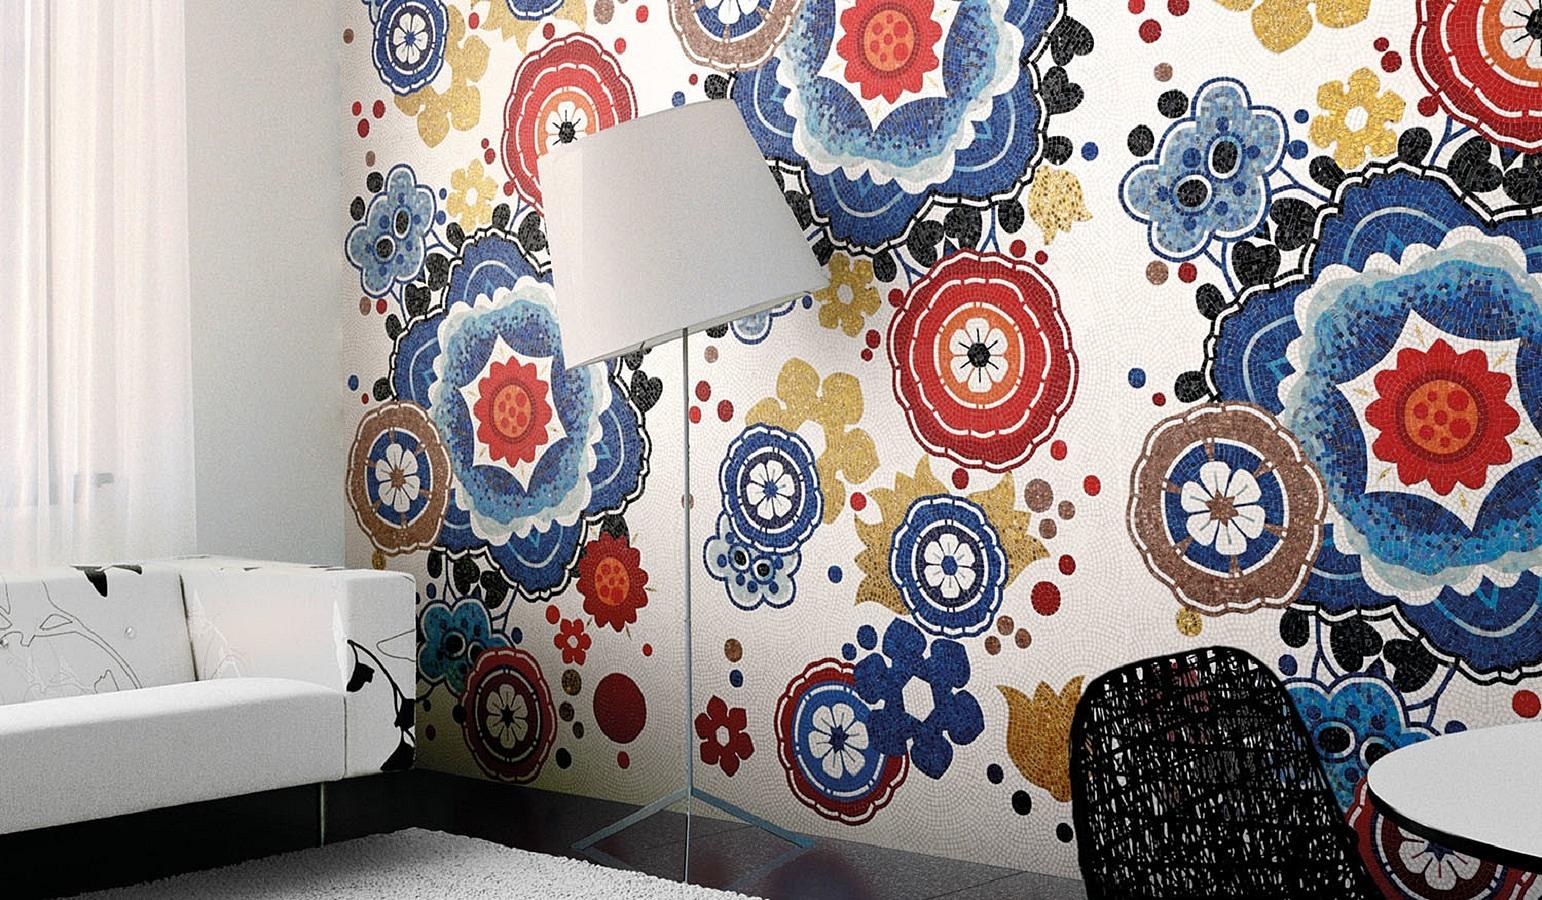 Decori in tecnica artistica de bisazza tile expert for Fournisseur carrelage